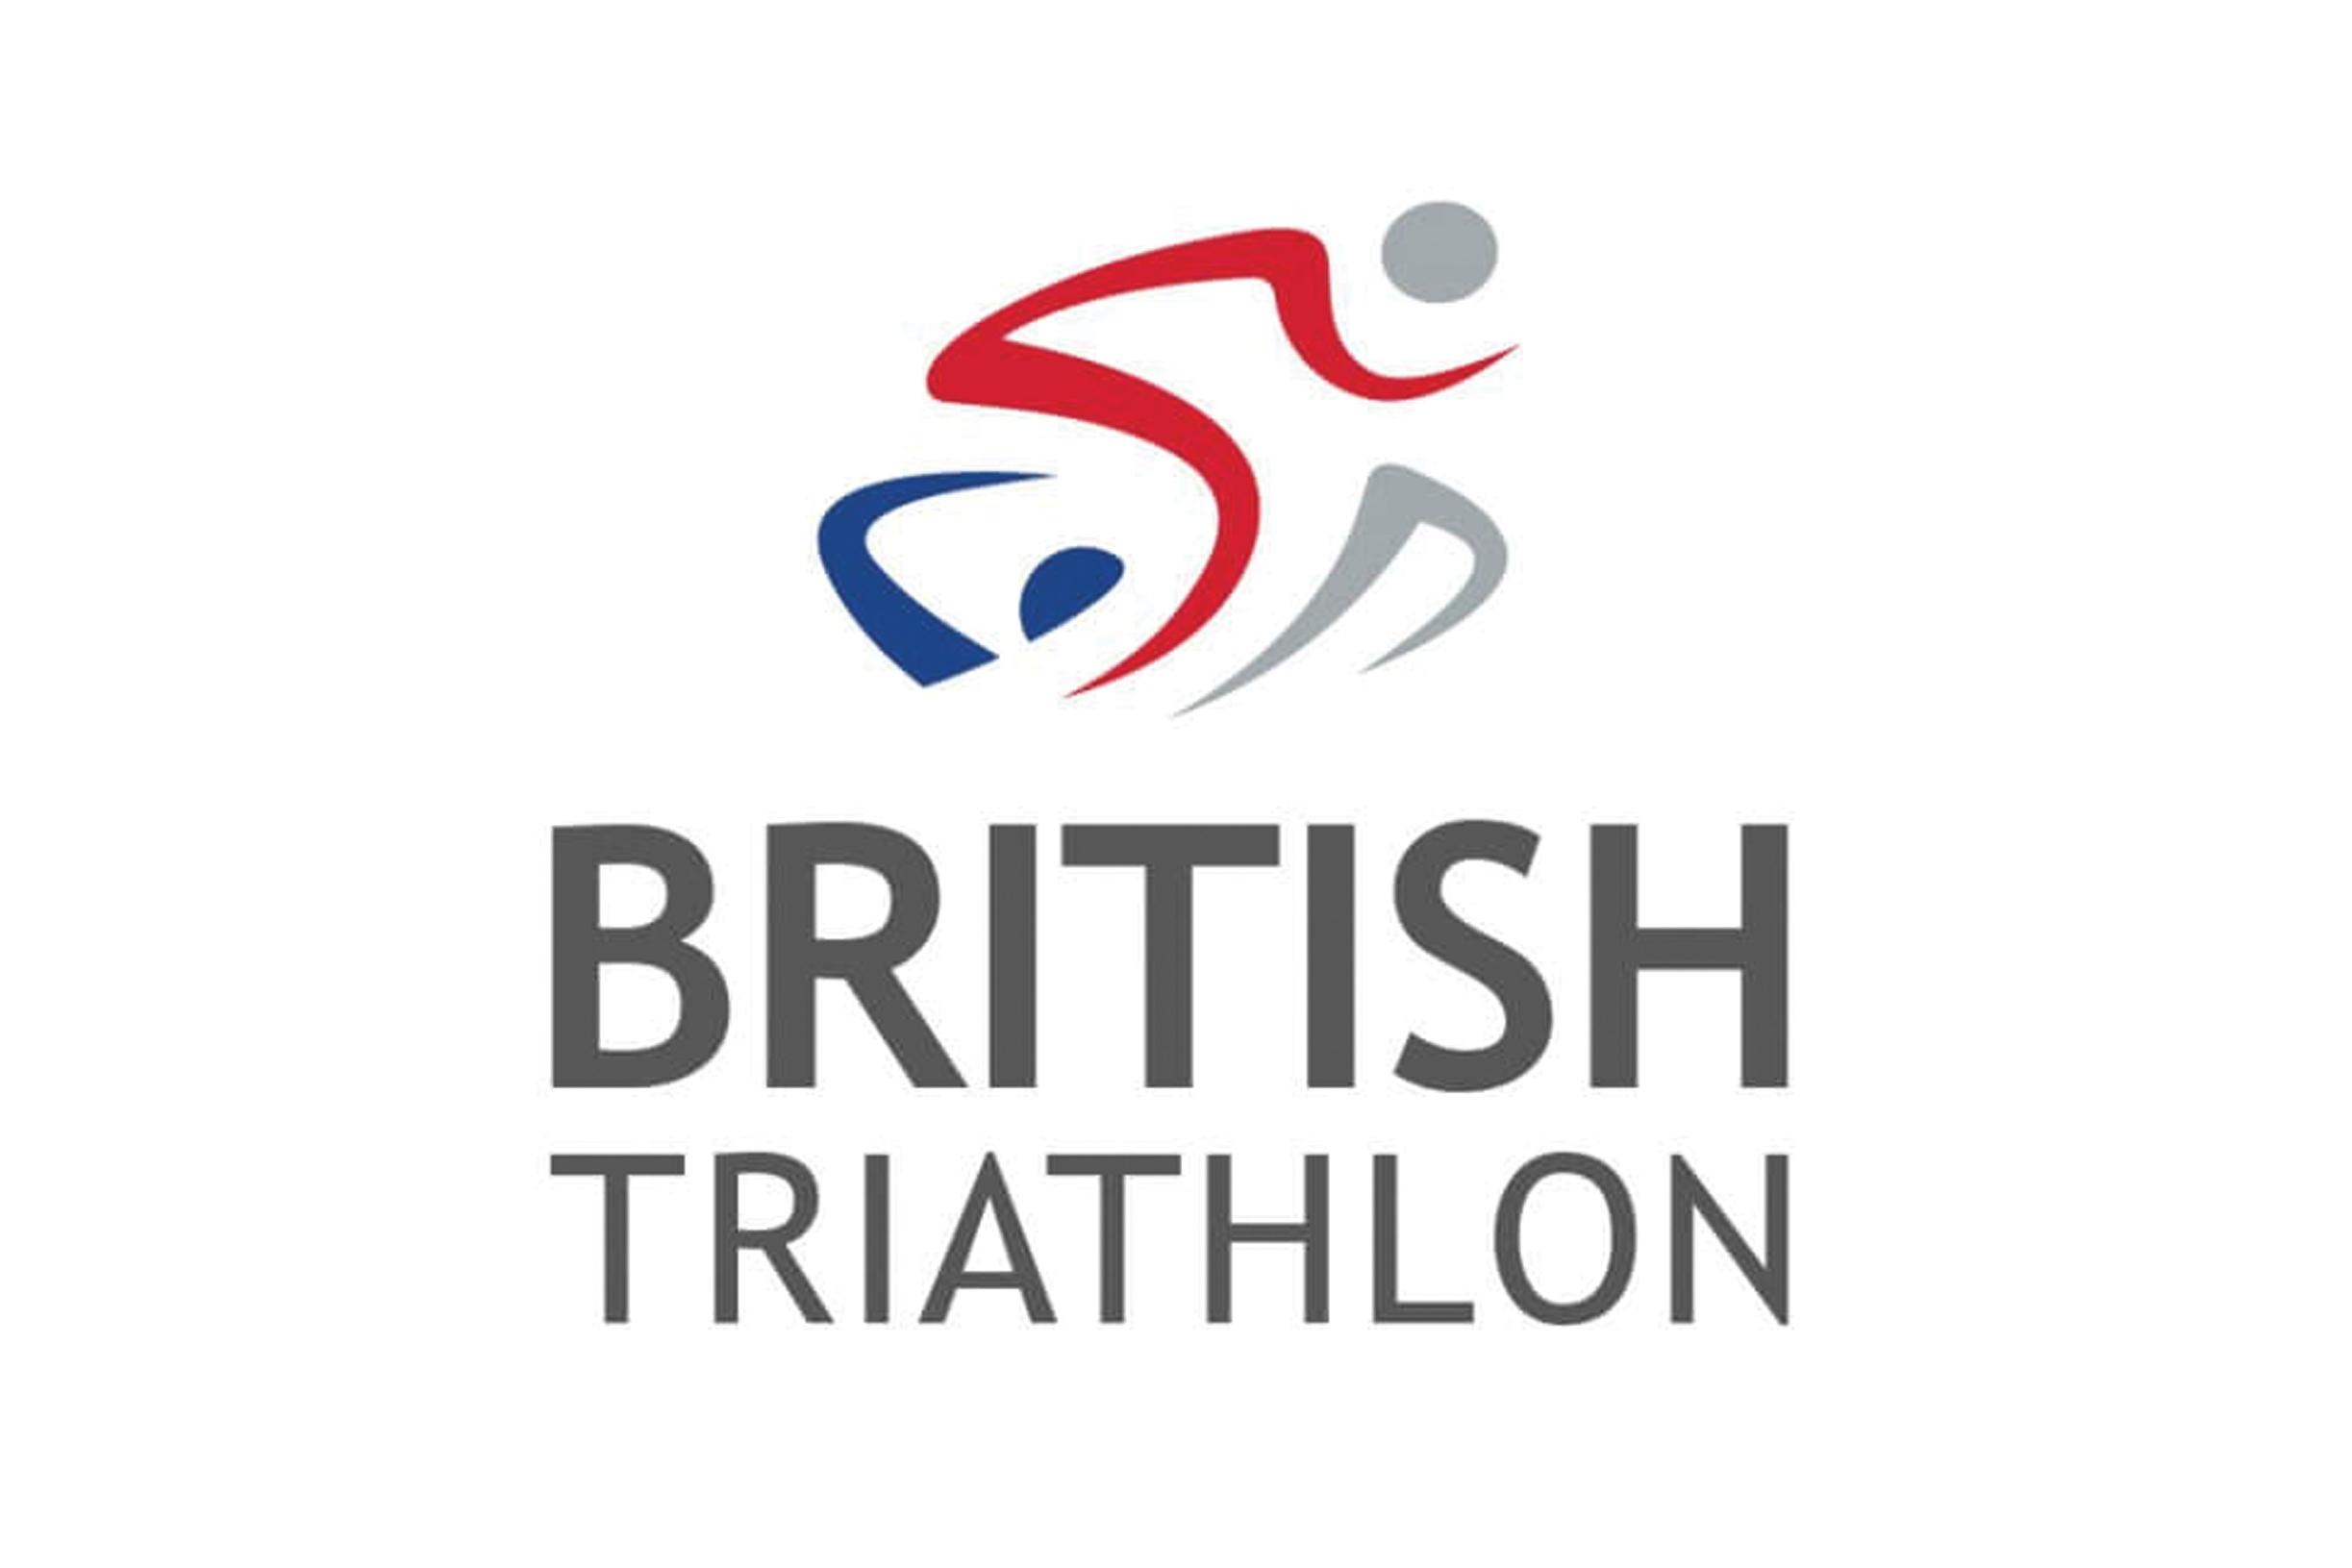 British Triathalon